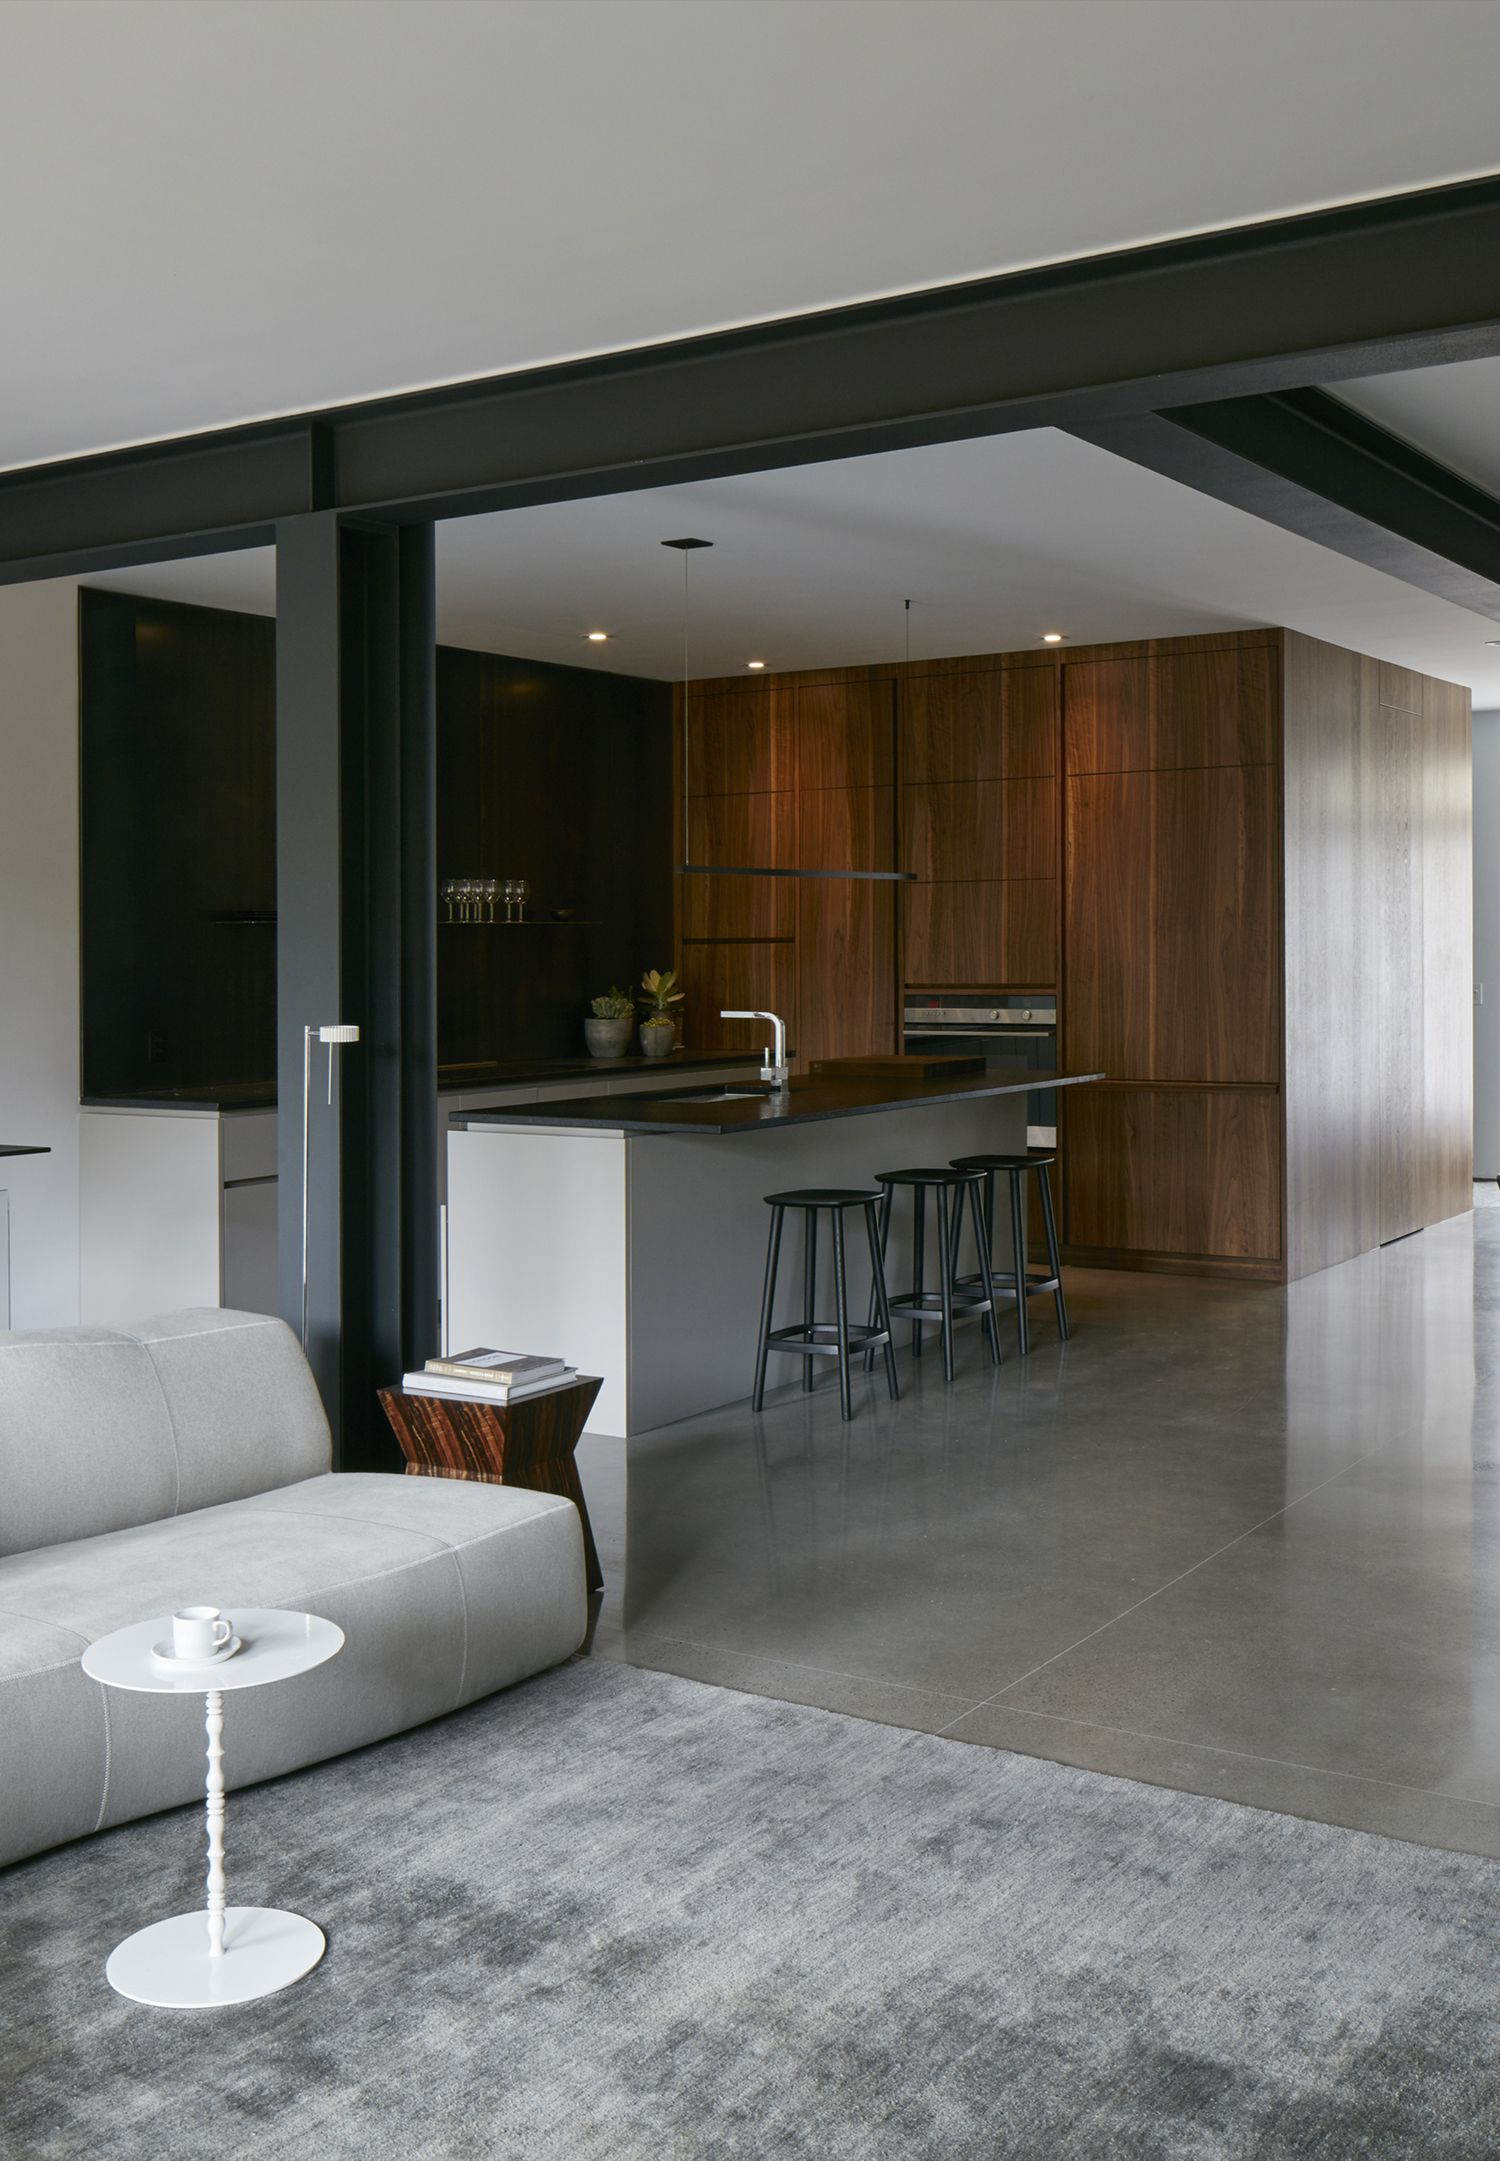 Pin By Yael Gilad On Colomn Kitchen Inspiration Modern Hotel Interior Design Industrial Interior Design